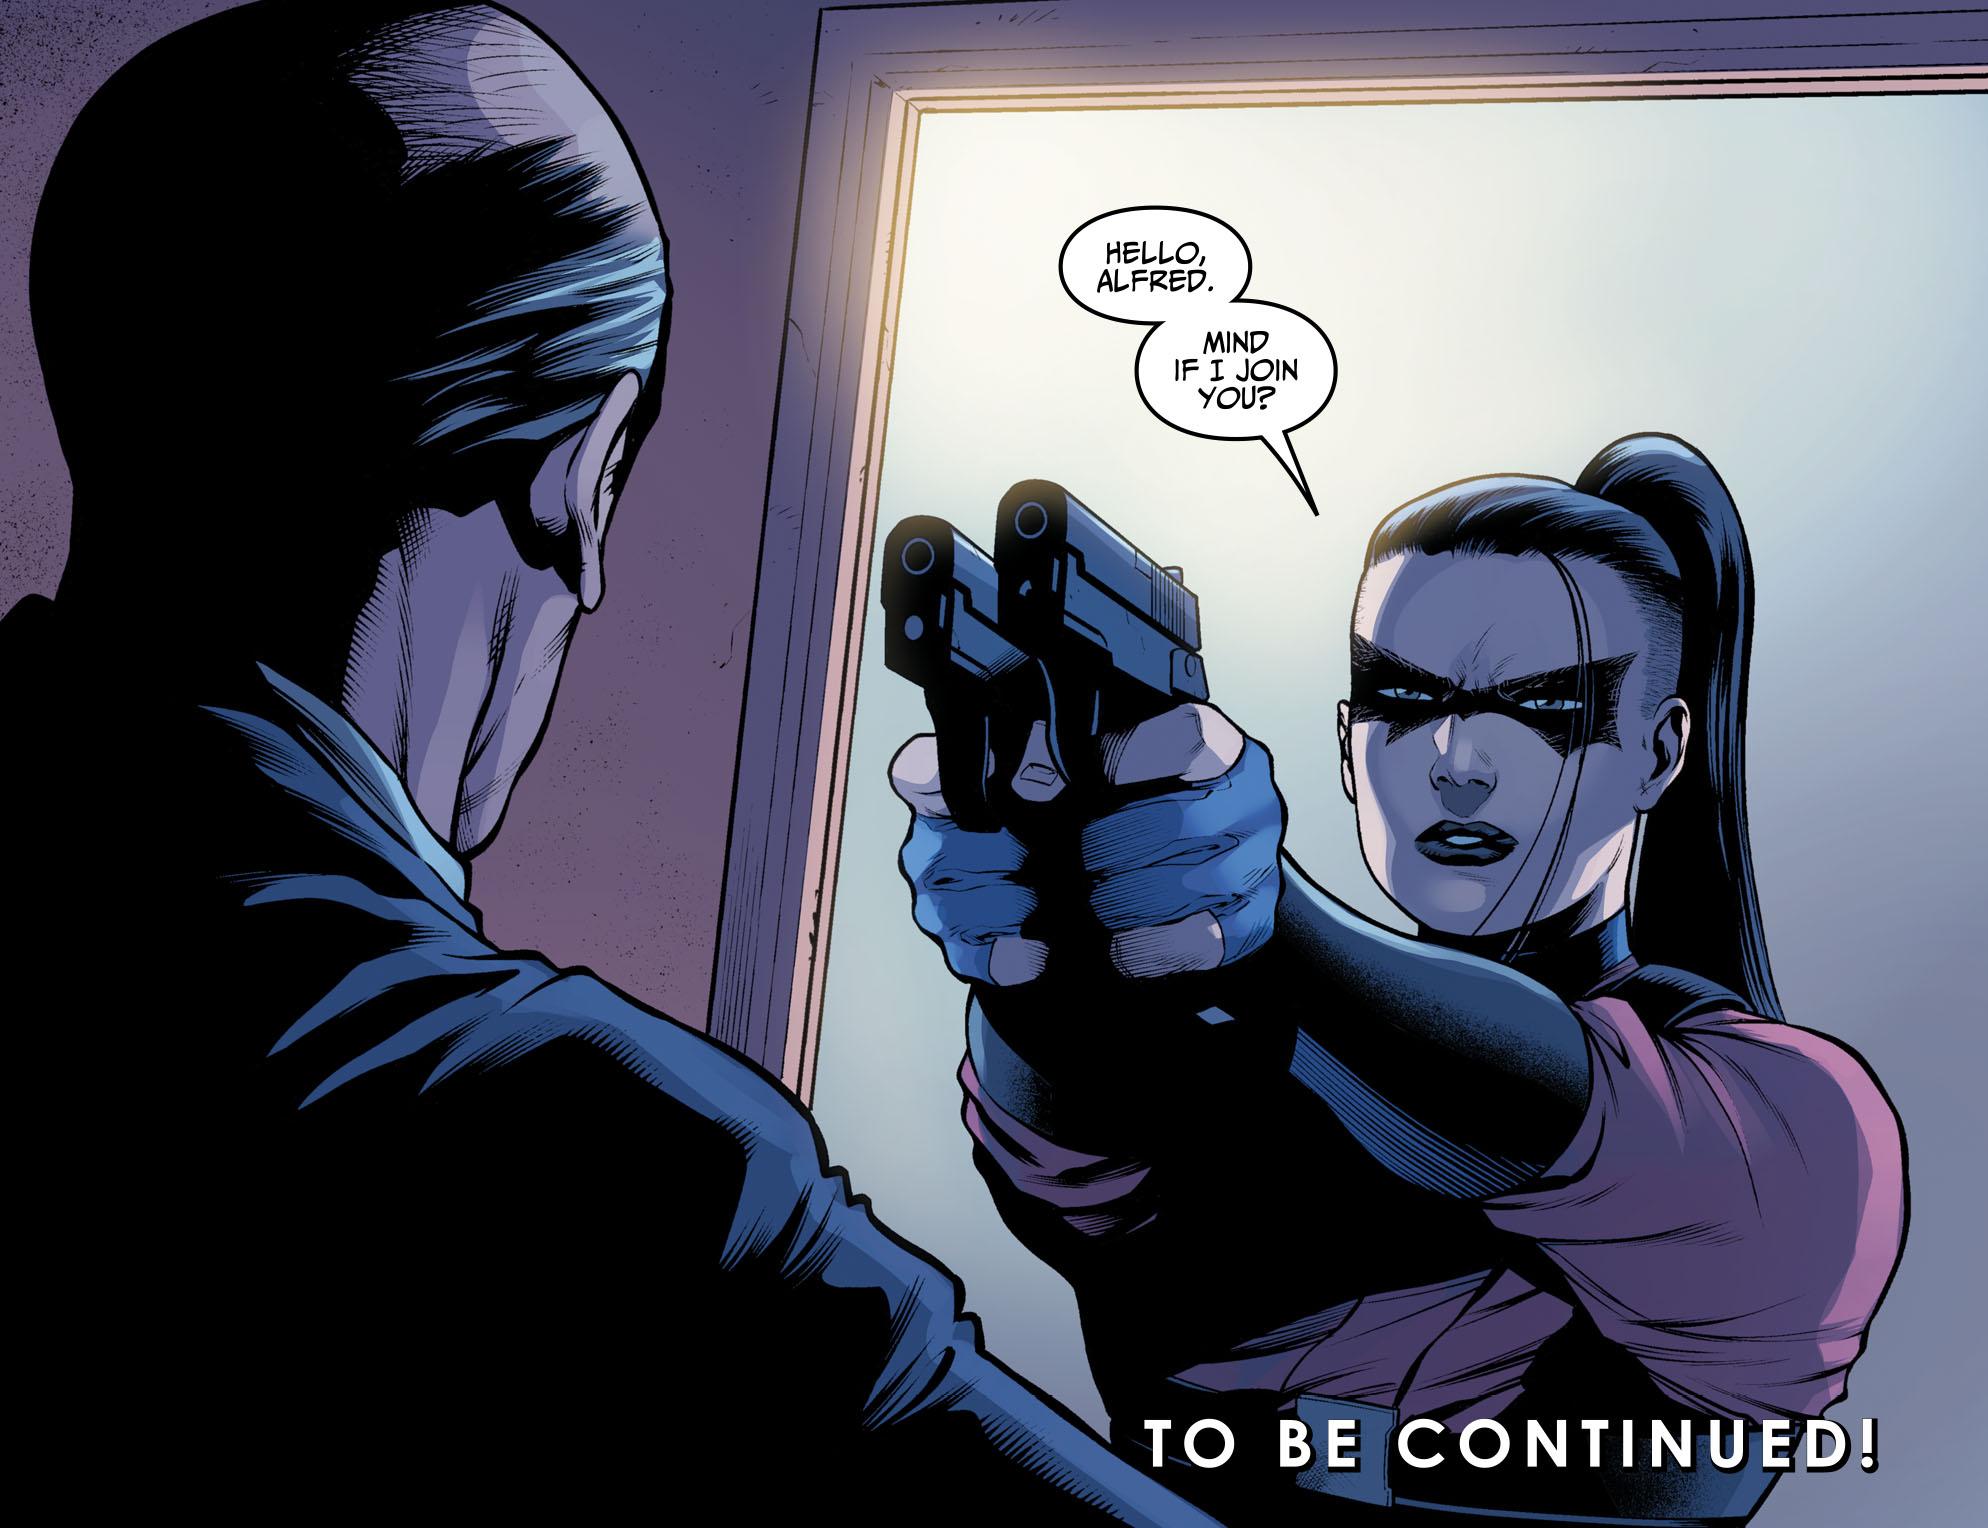 Athanasia Al Ghul Shot Catwoman (Injustice II) | Comicnewbies